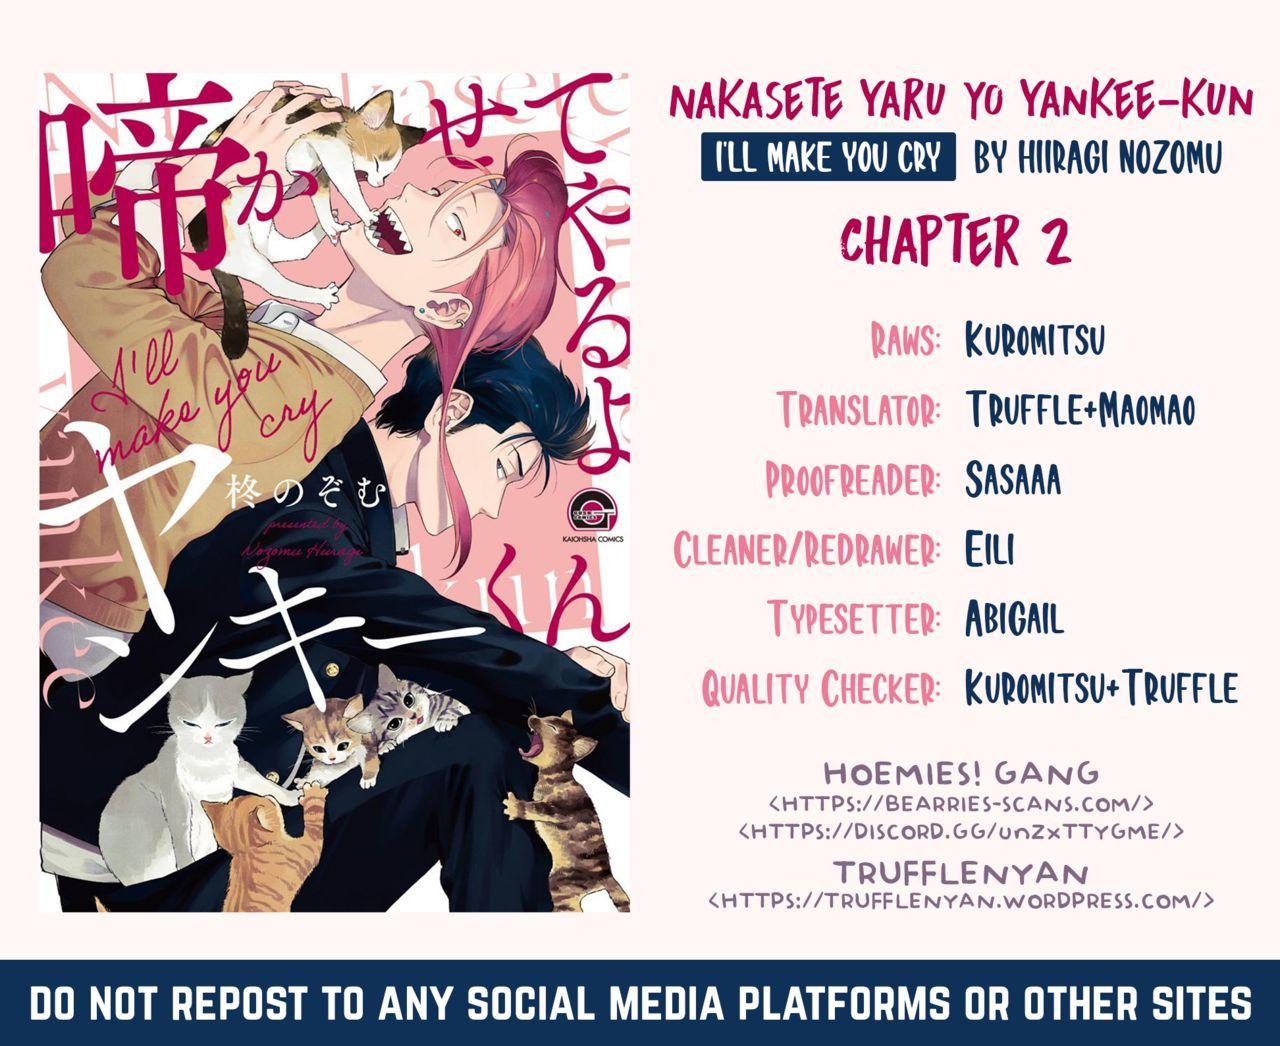 [Hiiragi Nozomu] Nakasete Yaru yo Yankee-kun   I'll Make You Cry Ch. 1-5 + Extras [English] [Digital] 47